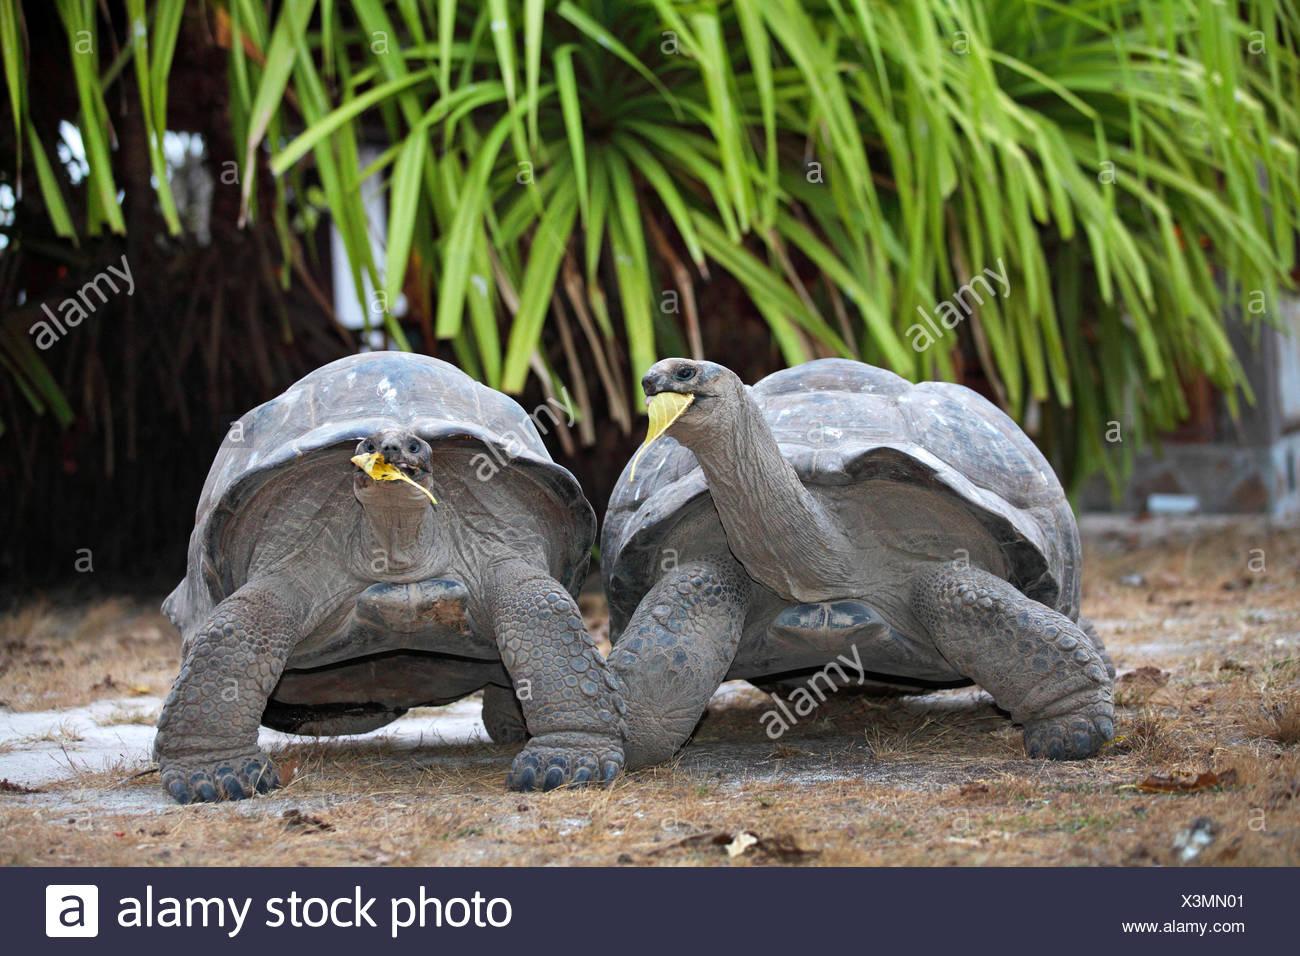 Seychelles giant tortoise, Aldabran giant tortoise, Aldabra giant tortoise (Aldabrachelys gigantea, Testudo gigantea, Geochelone gigantea, Megalochelys gigantea), two Seychelles giant tortoises feeding, Seychelles, Bird Island - Stock Image